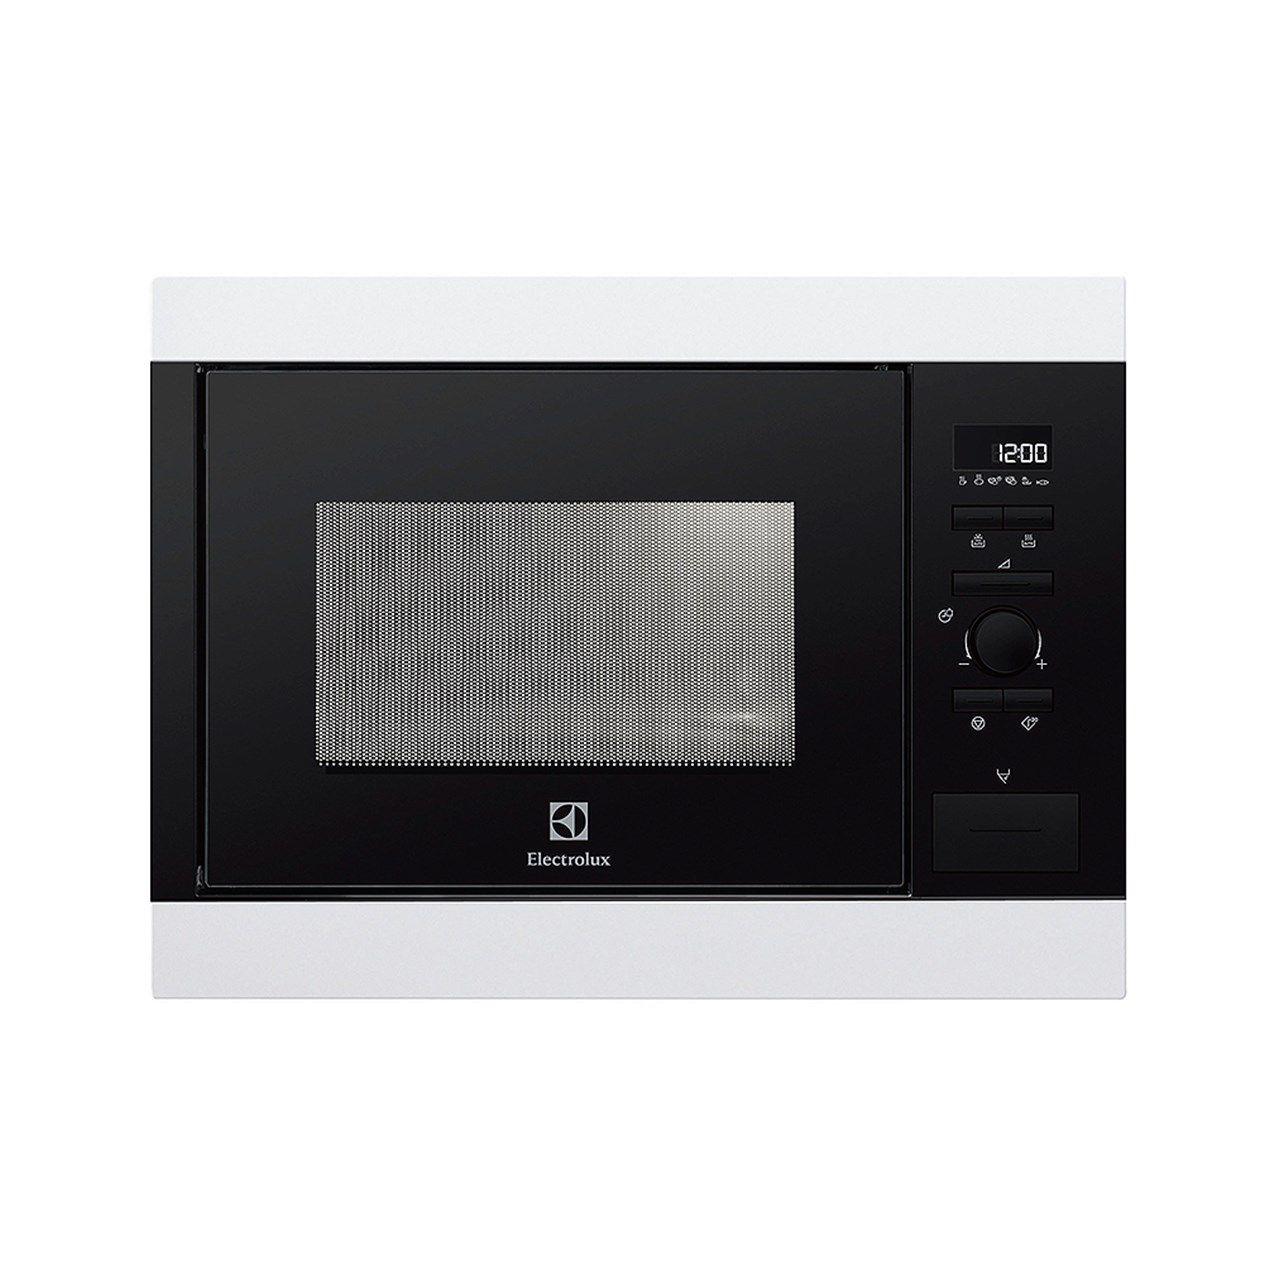 Mikrovagsugn Electrolux Ems17175ow Vit 947608643 Kitchen Appliances Microwave Appliances